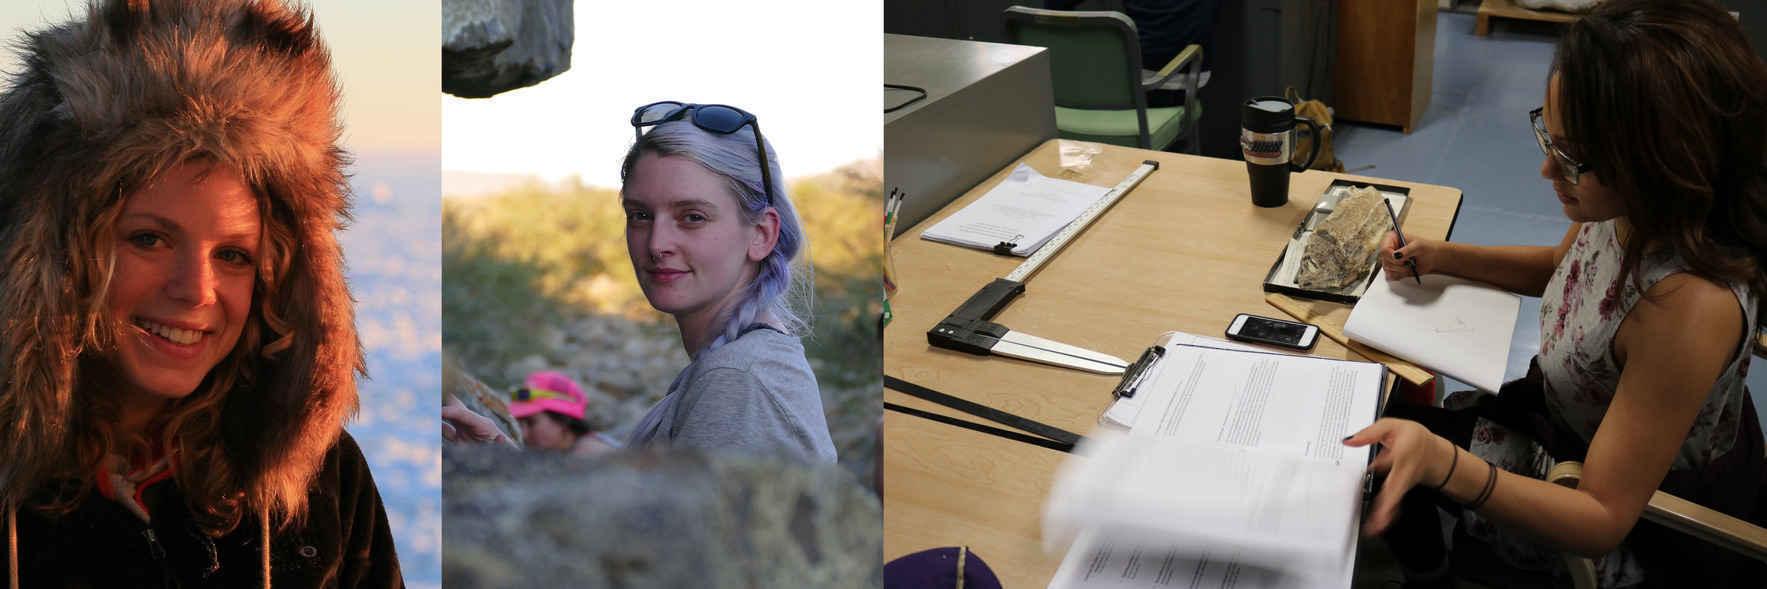 Empower Outstanding Women Geoscientists image